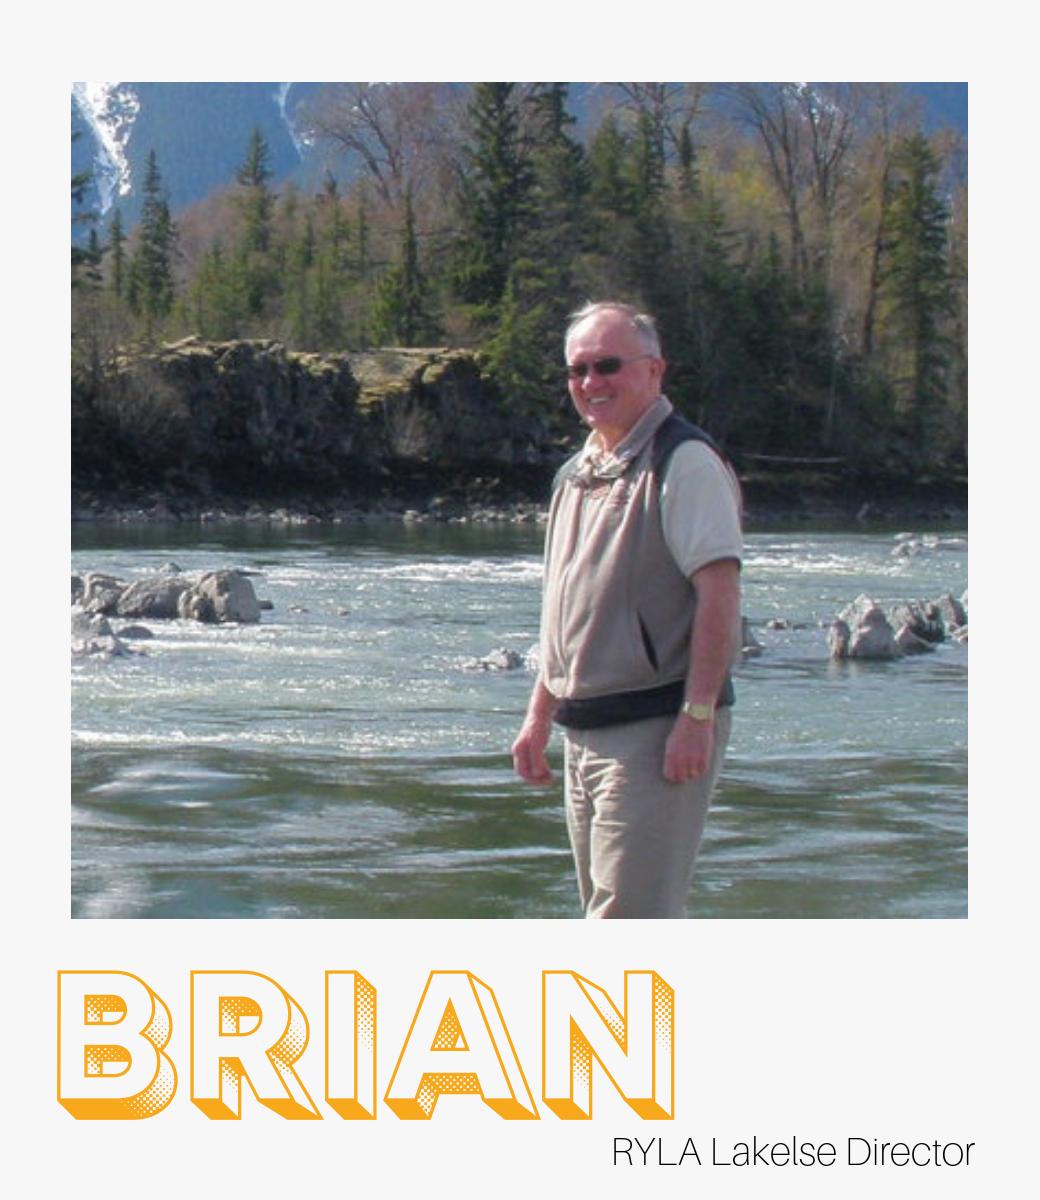 Brian - RYLA Lakelse Director